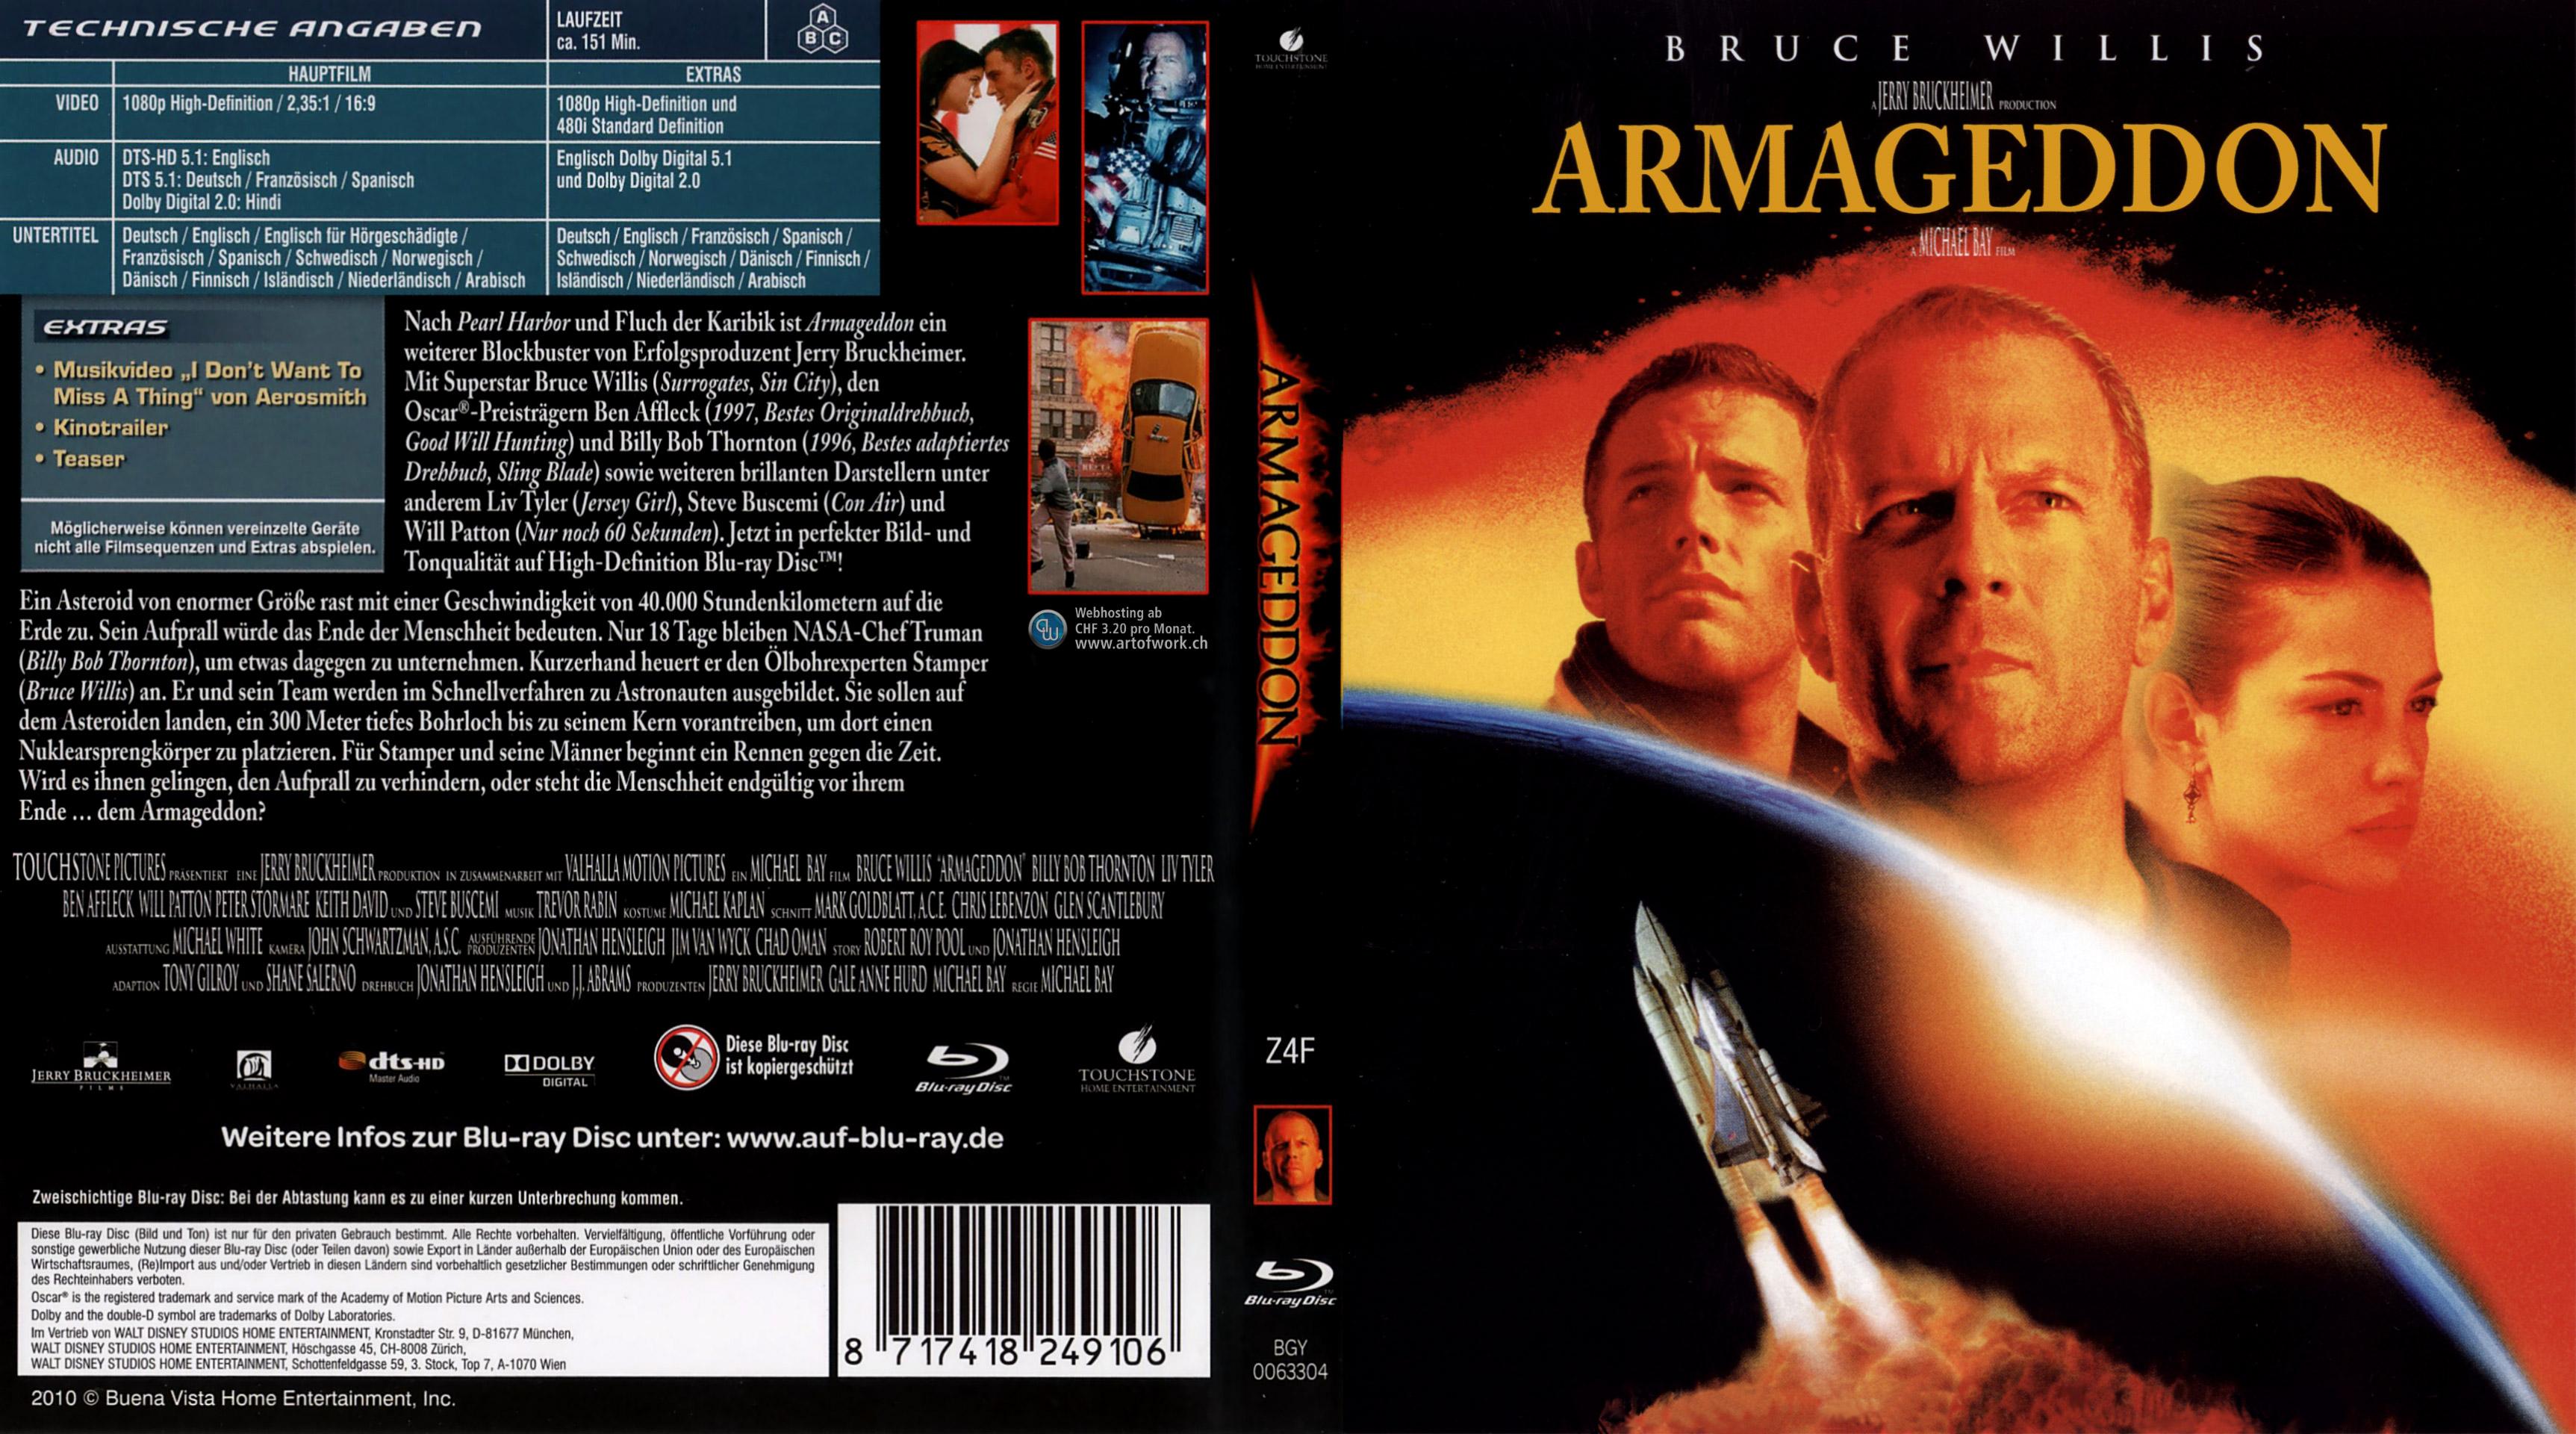 Covers Box Sk Armageddon 1998 High Quality Dvd Blueray Movie